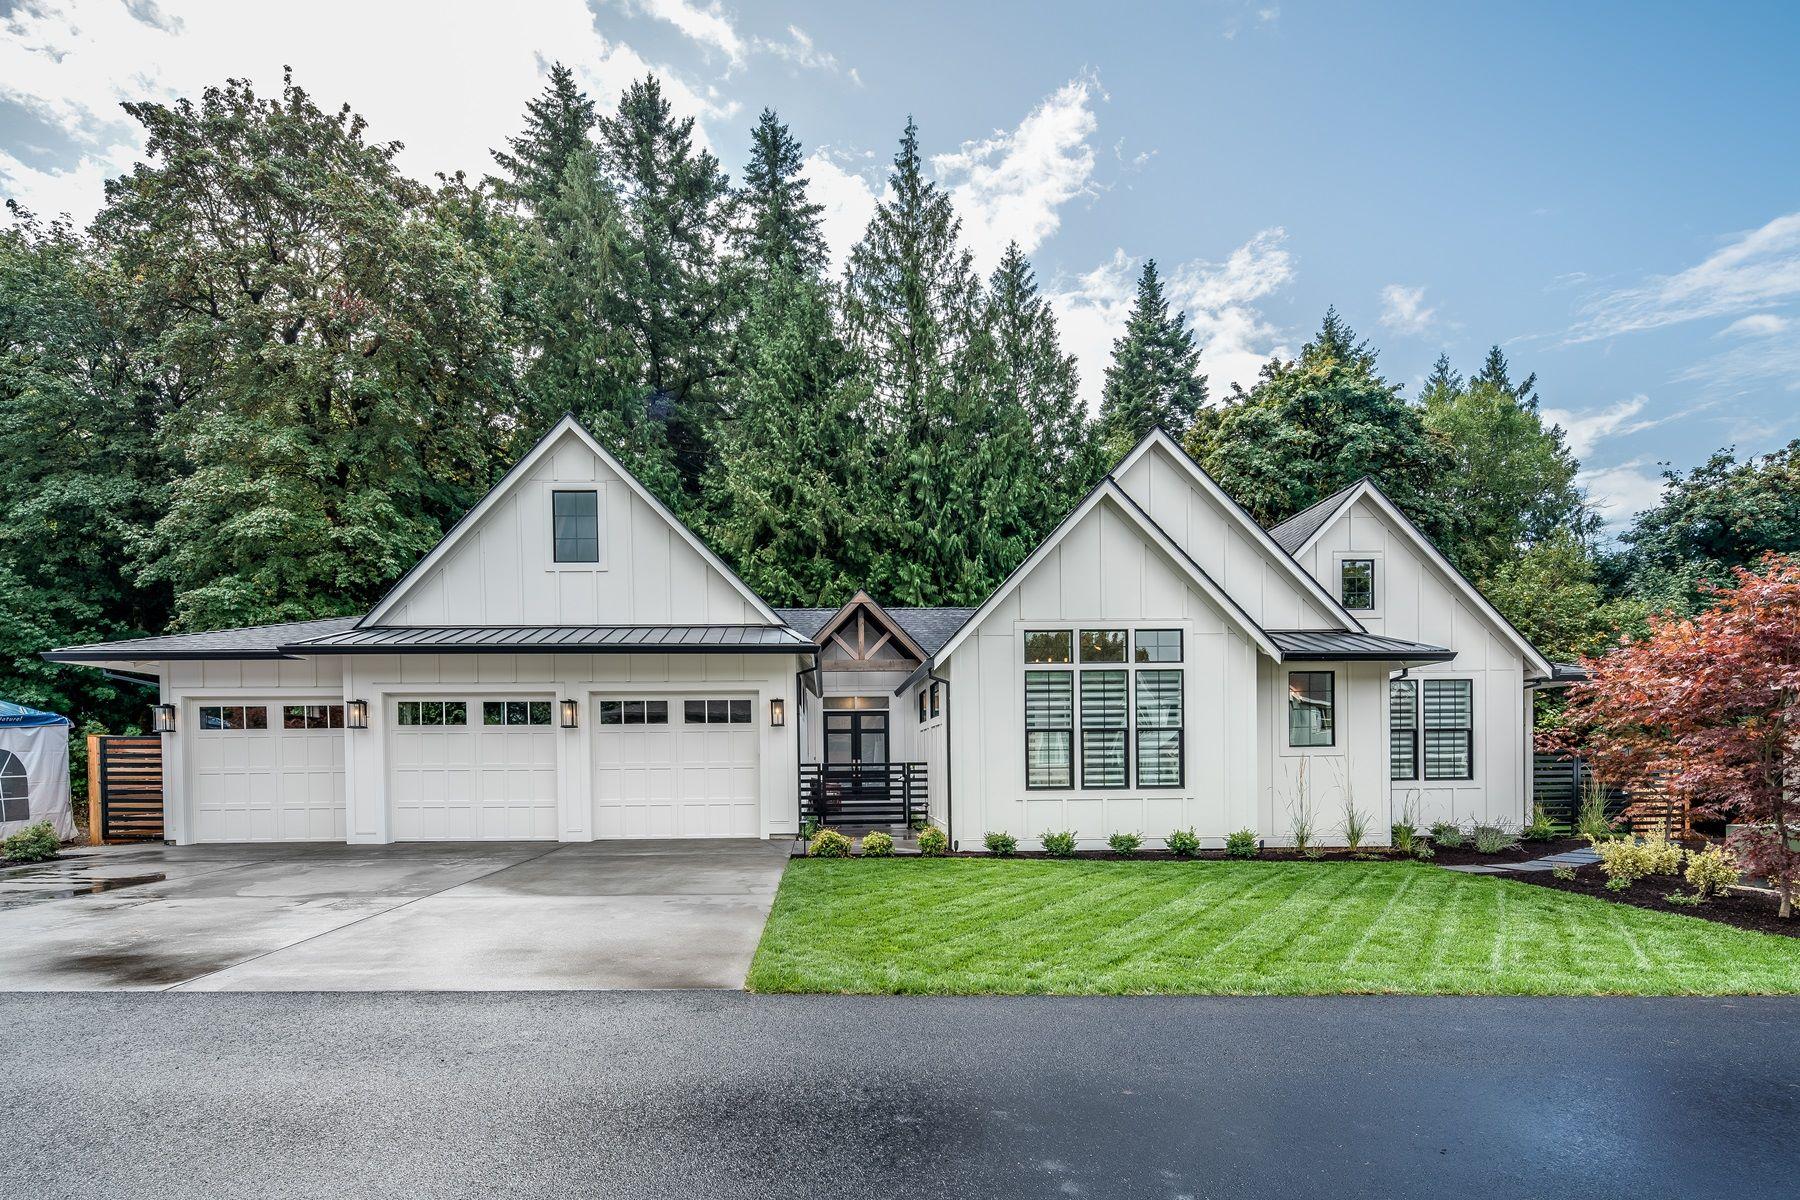 Single Family Homes for Sale at 3428 NW MCMASTER DR Camas, Washington 98607 United States